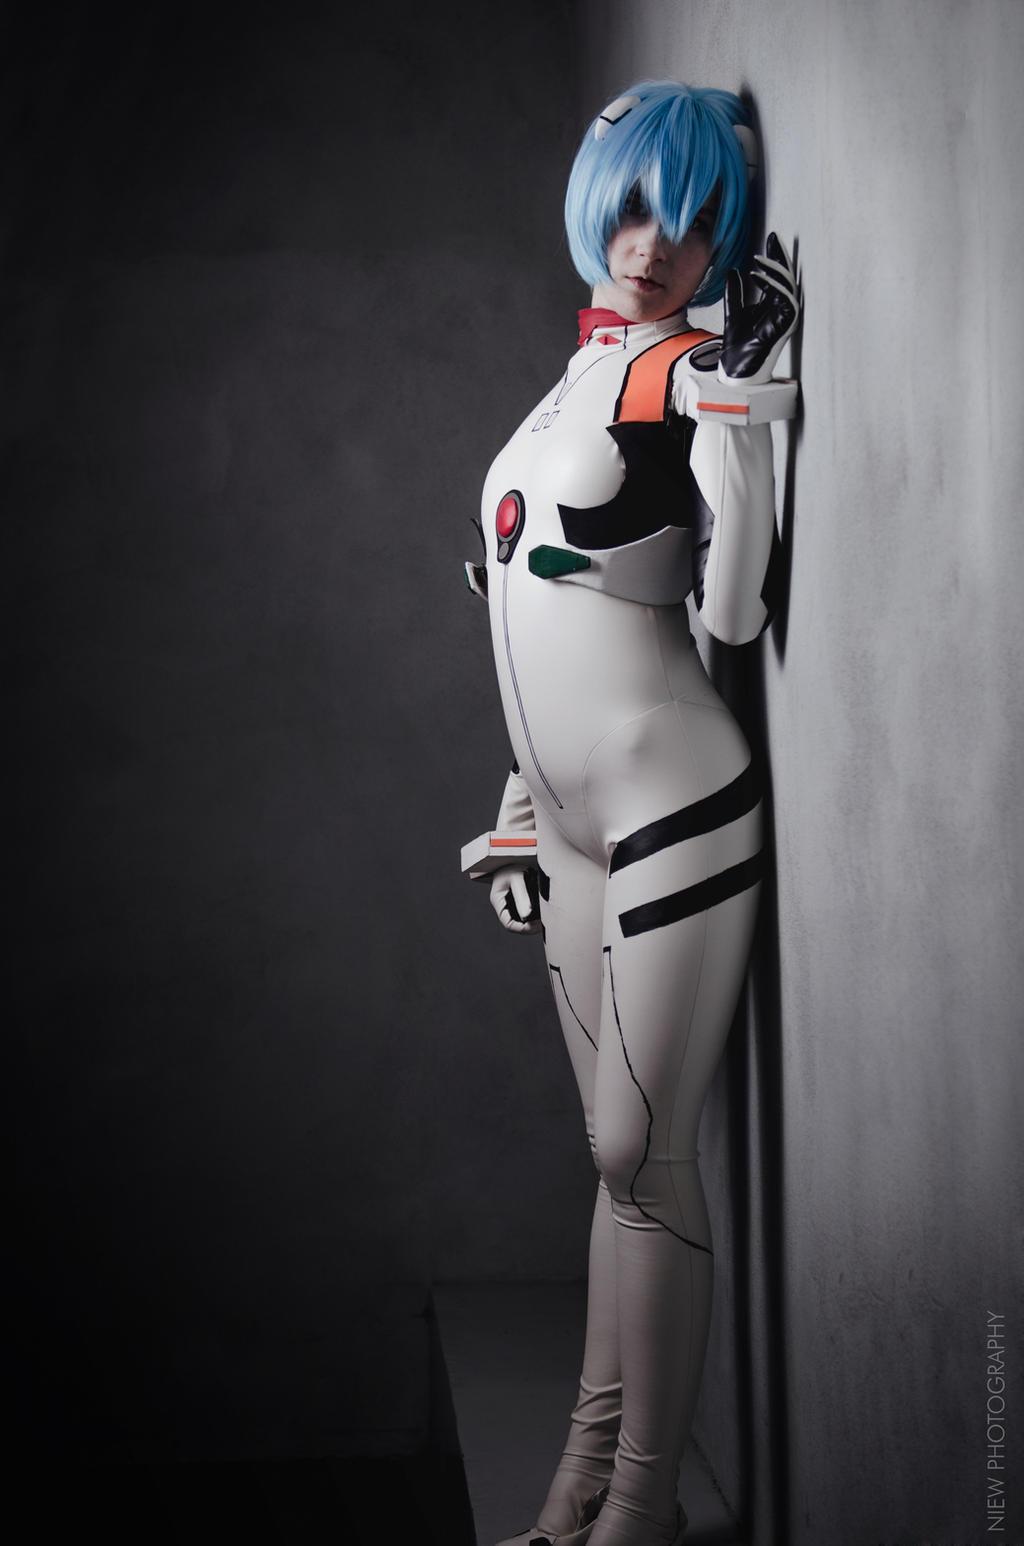 Rei Ayanami - Leaning by jatek